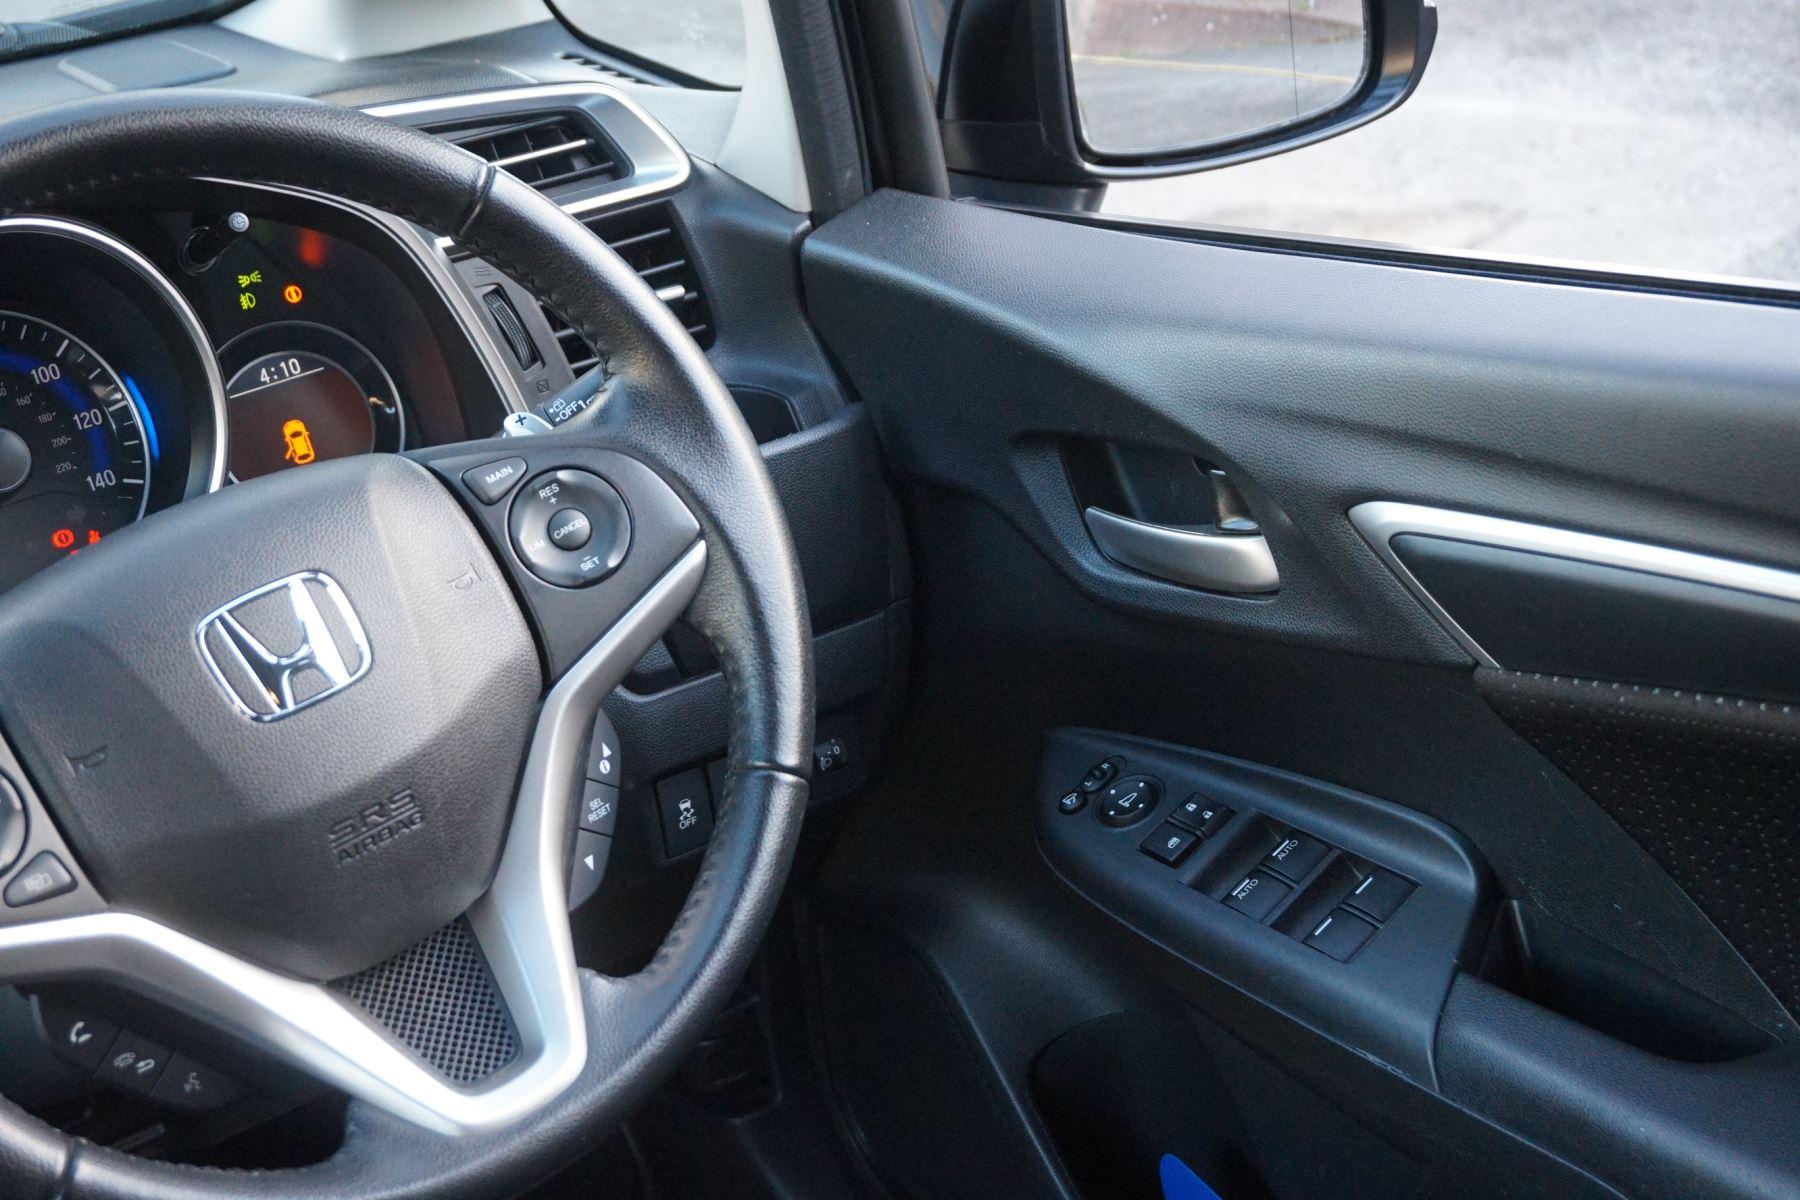 Honda Jazz 1.3 EX CVT image 11